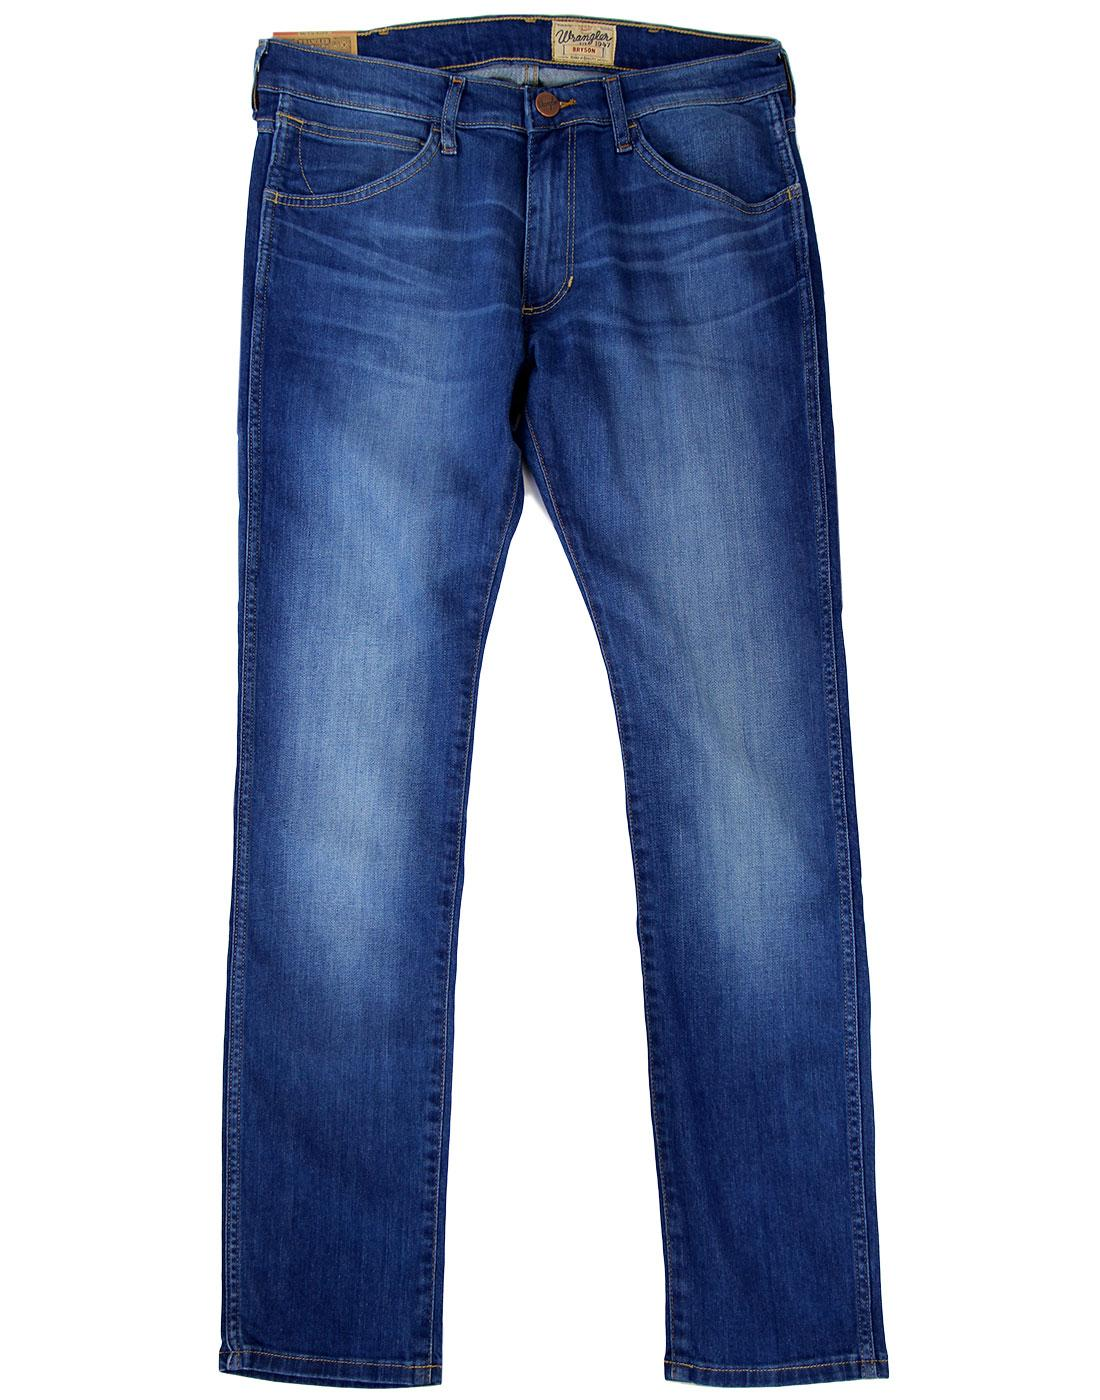 Bryson WRANGLER Blue Bream Super Skinny Jeans